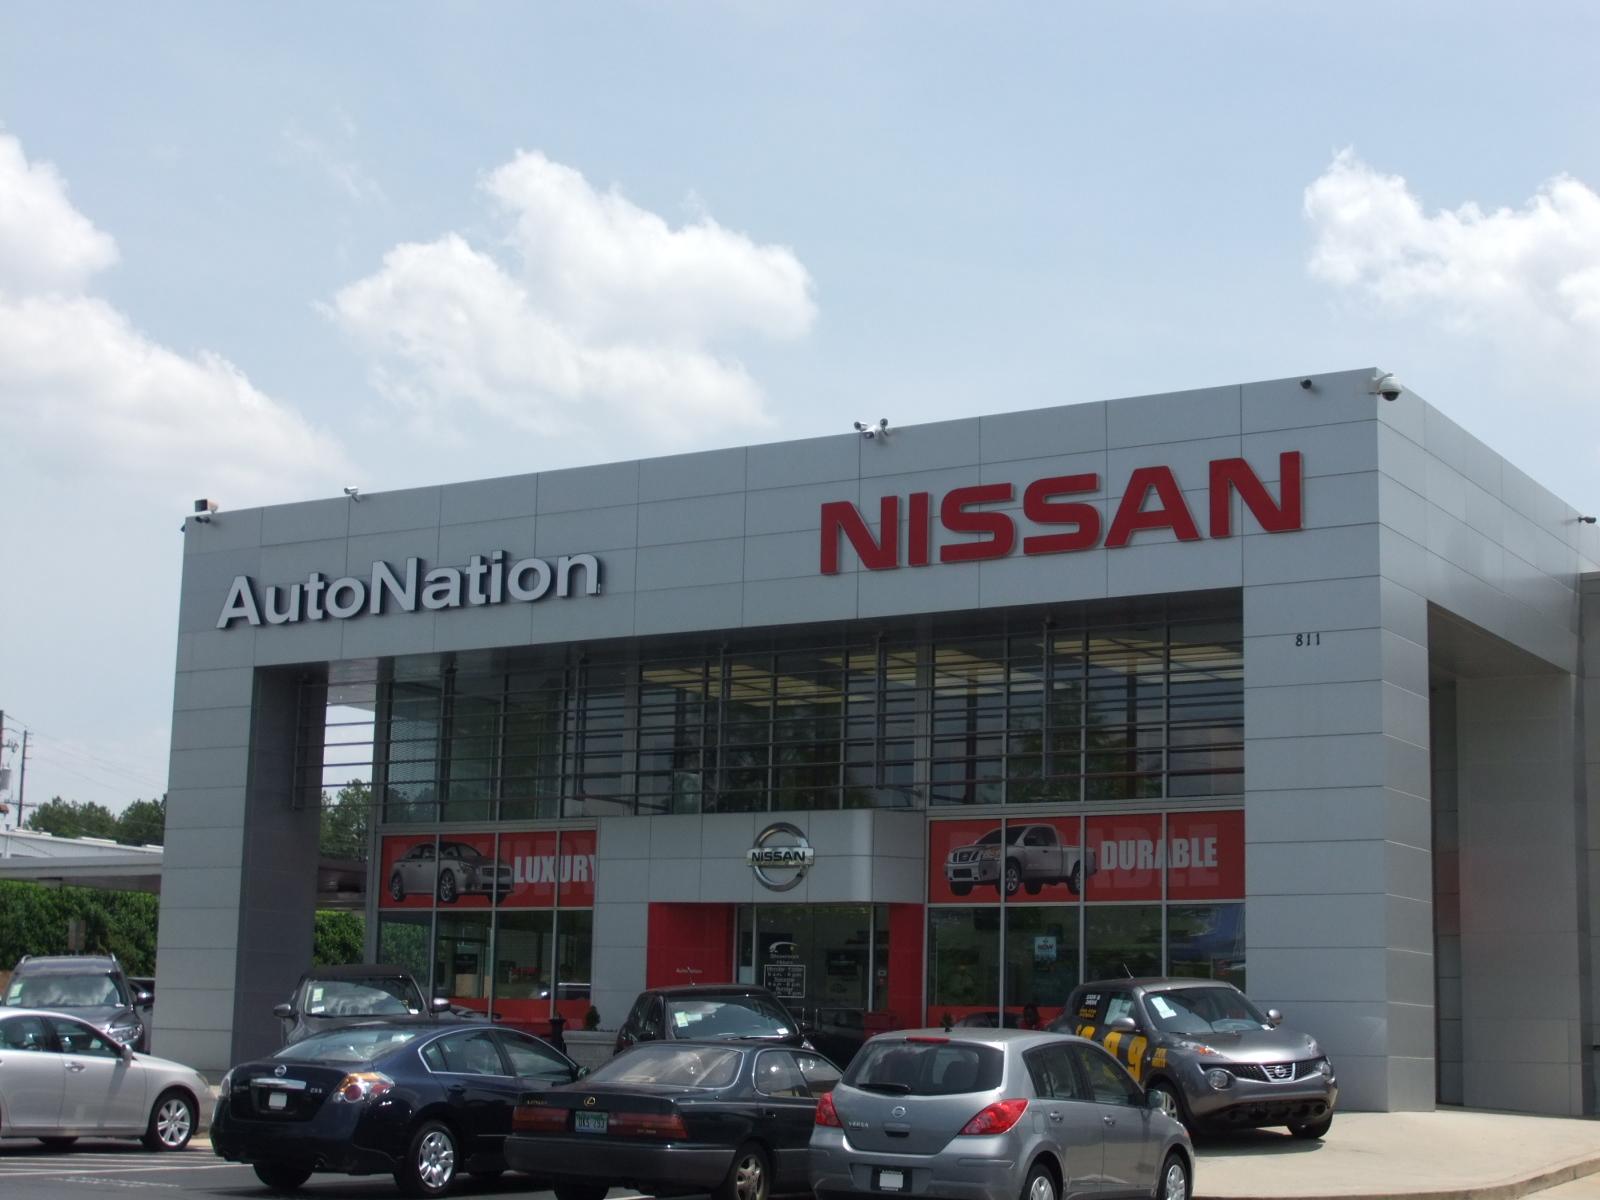 AutoNation Nissan Thornton Road - Lithia Springs, GA -